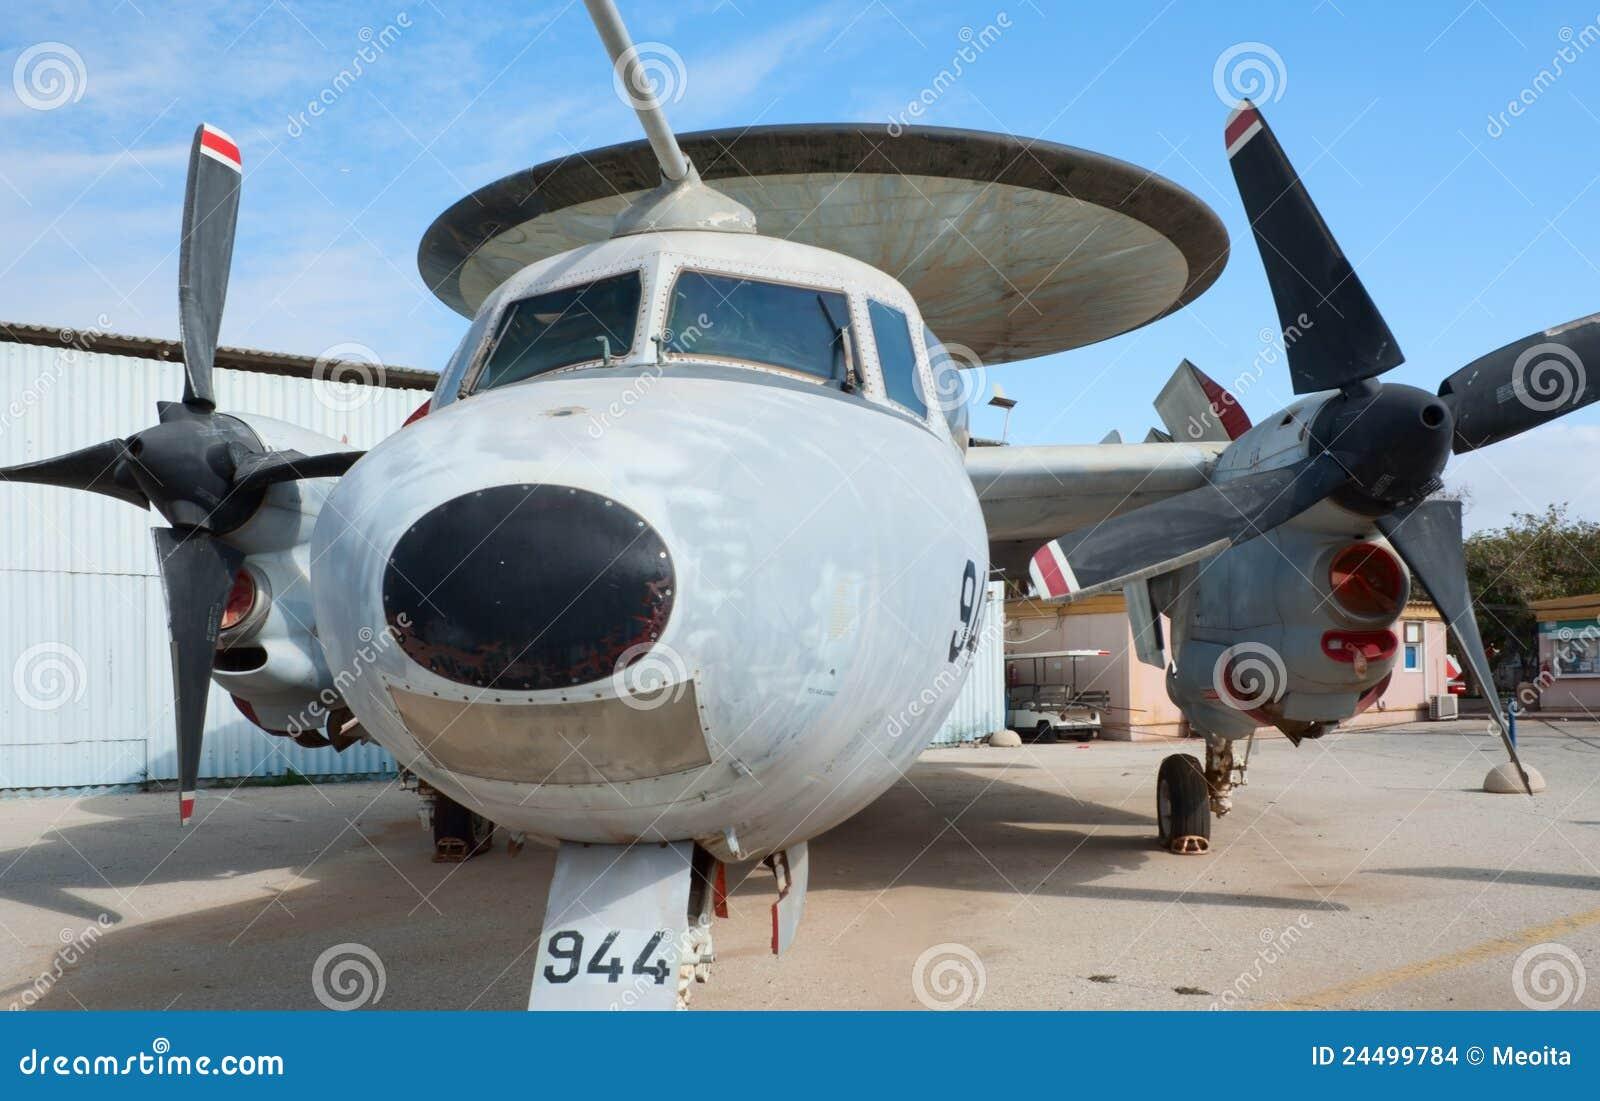 "Maxford USA Northrop Grumman E-2C Hawkeye EP 71"" RC Scale Plane ..."